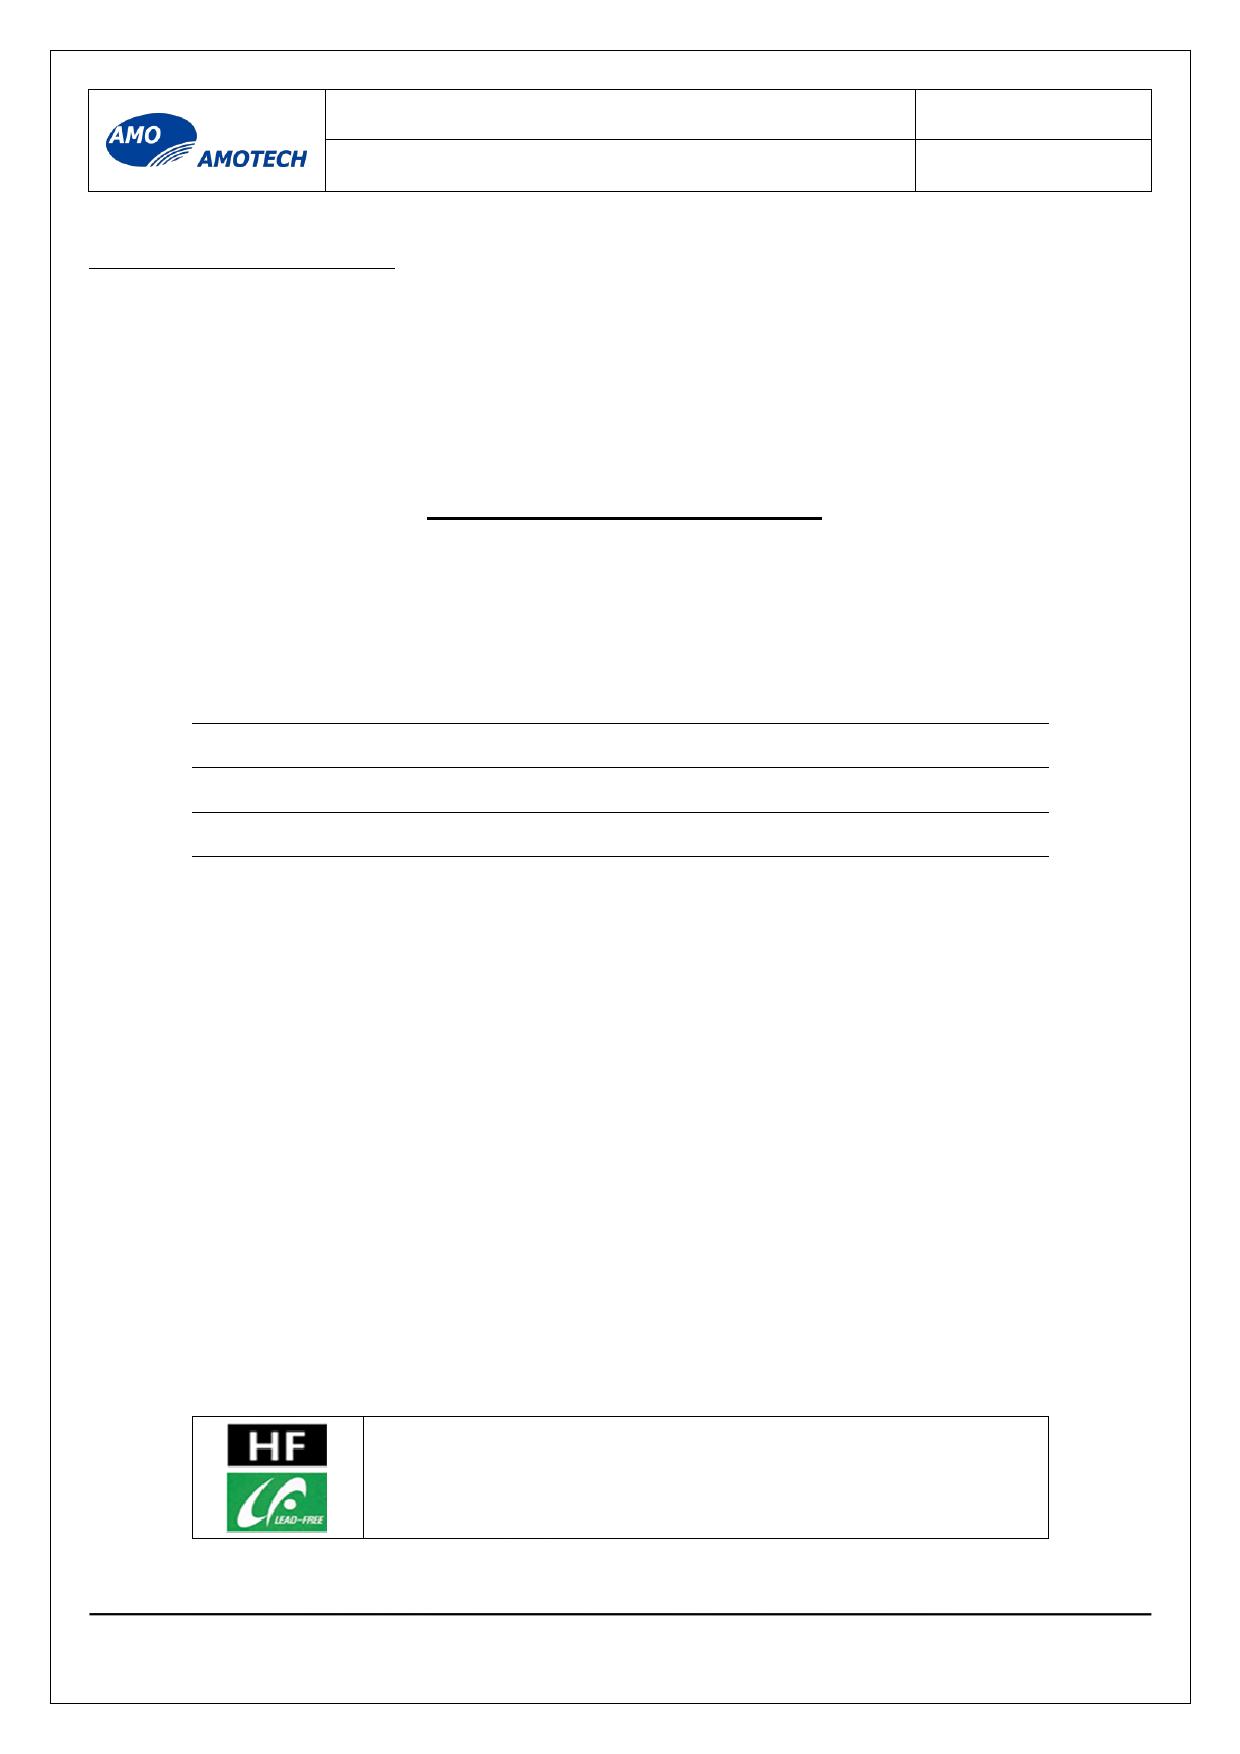 ACFE1A2G900E Datasheet